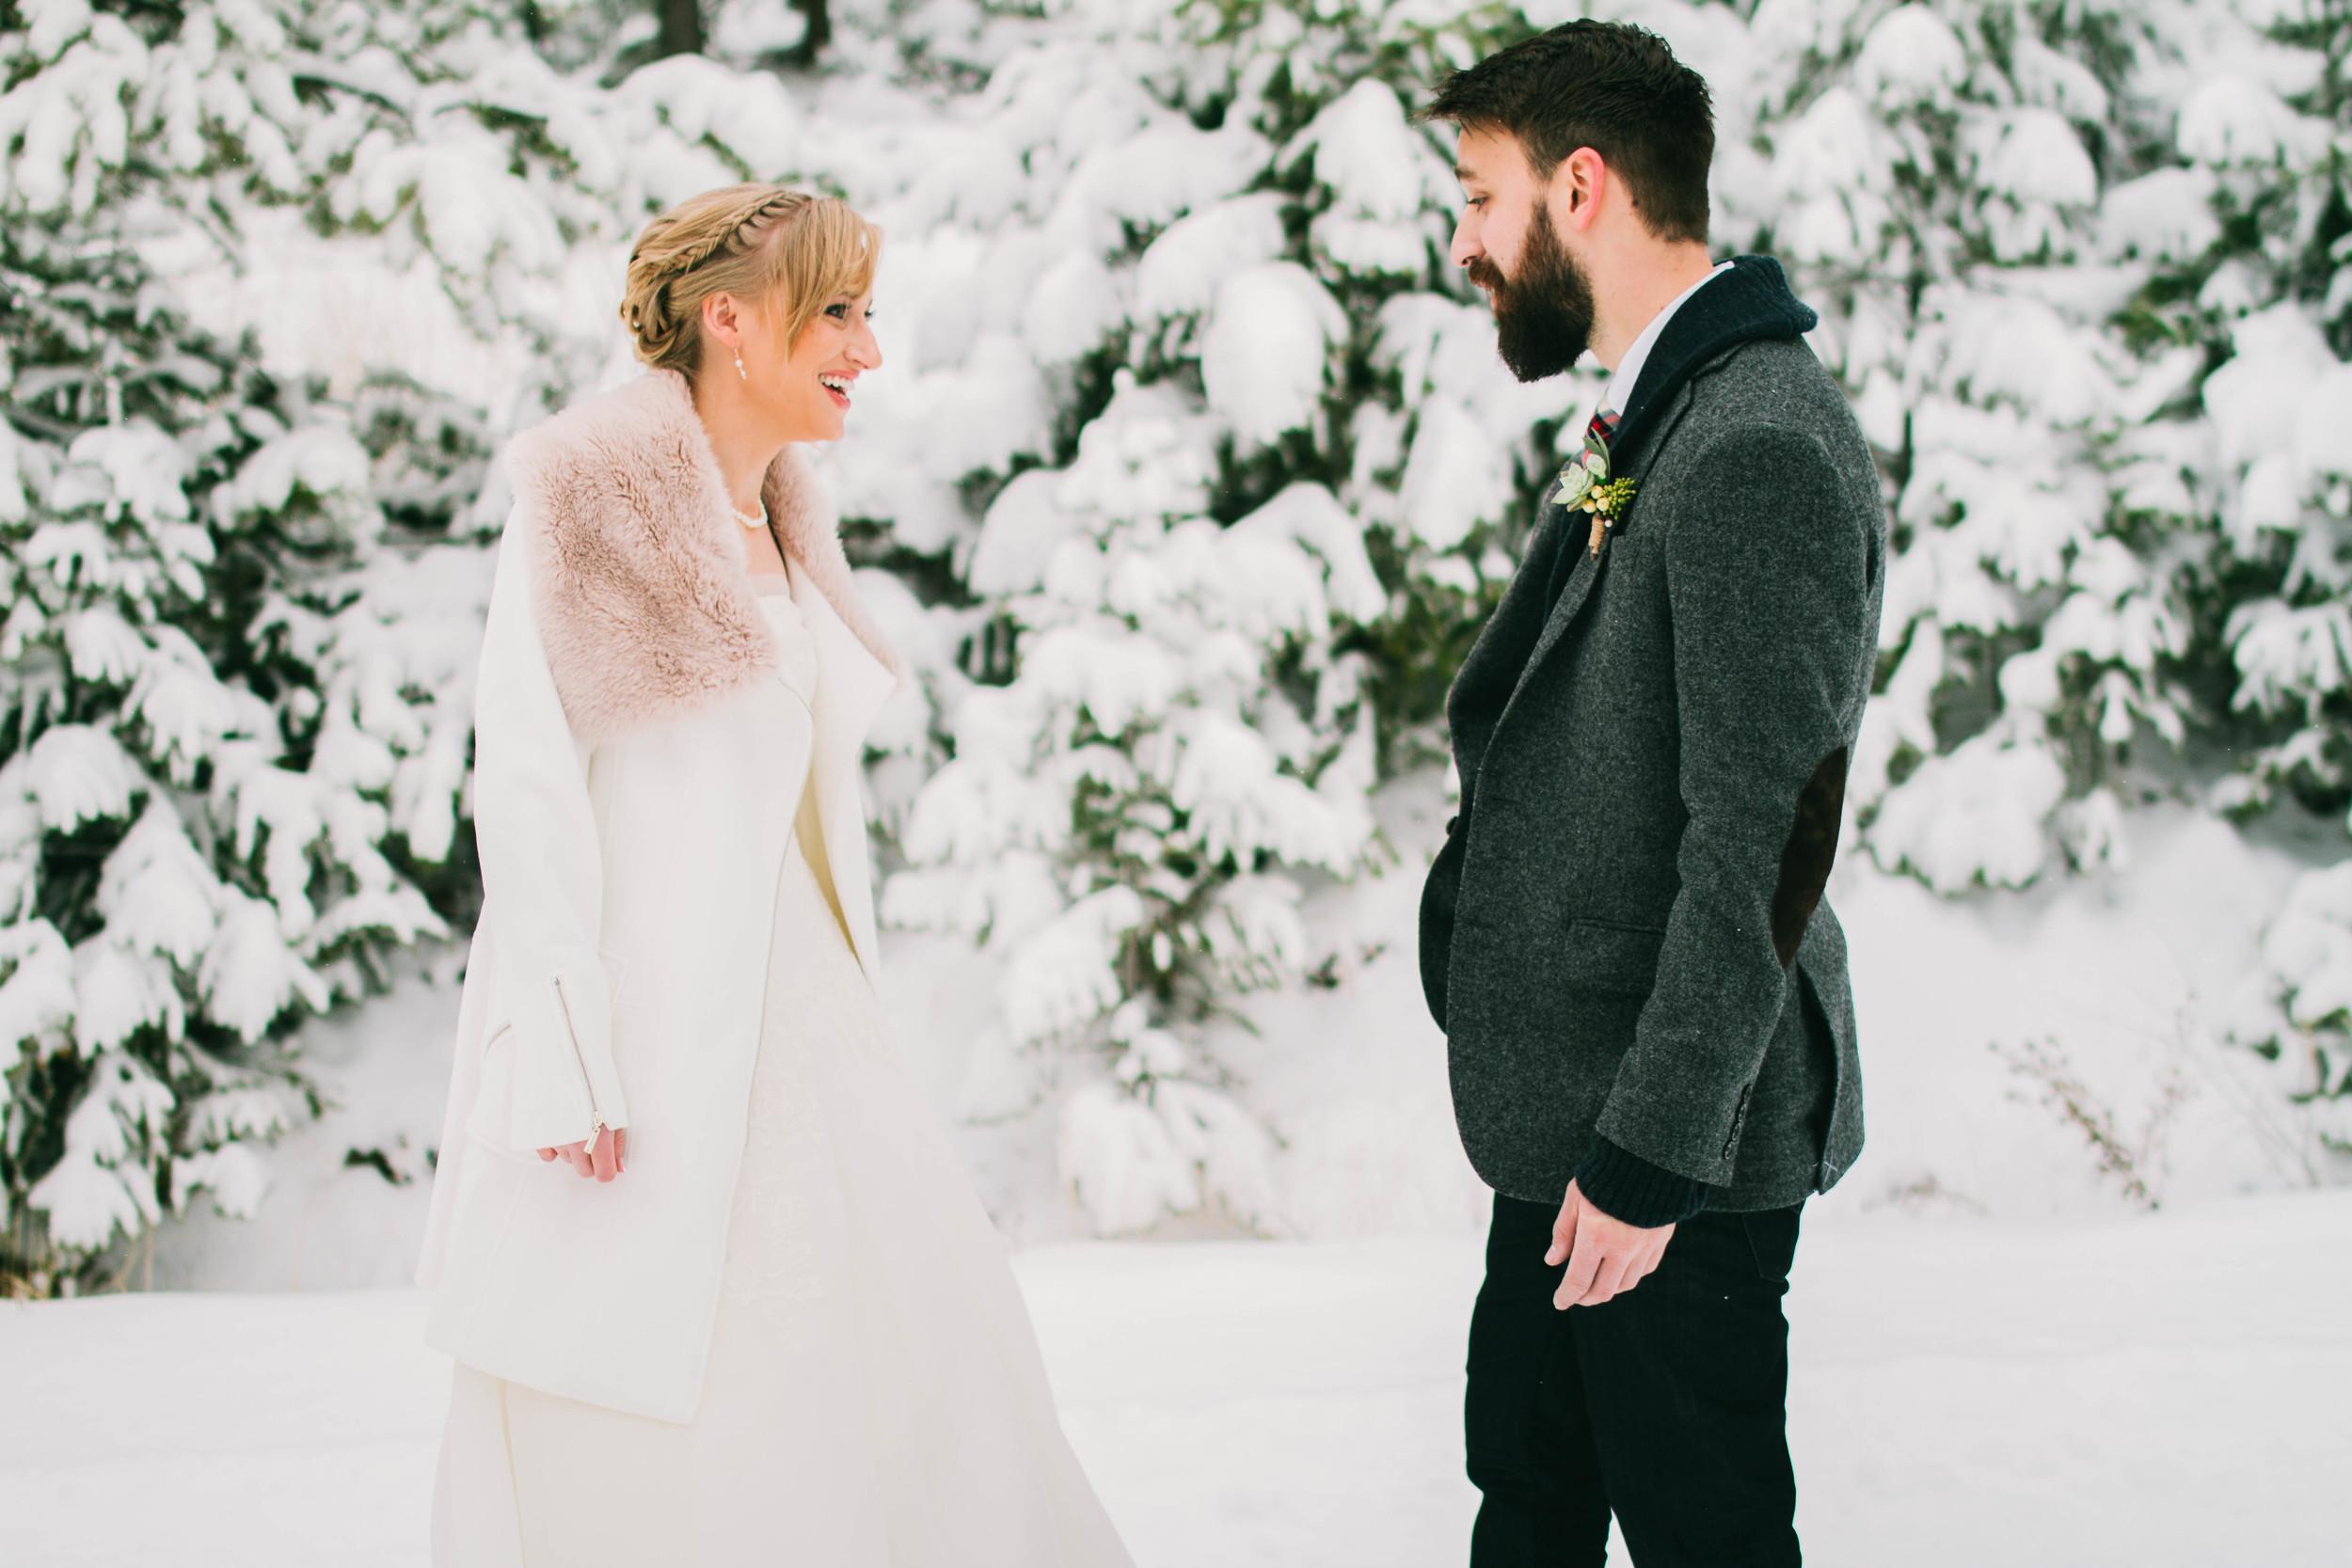 Bonin Wedding - Madeleine Bonin Photography-5722.jpg